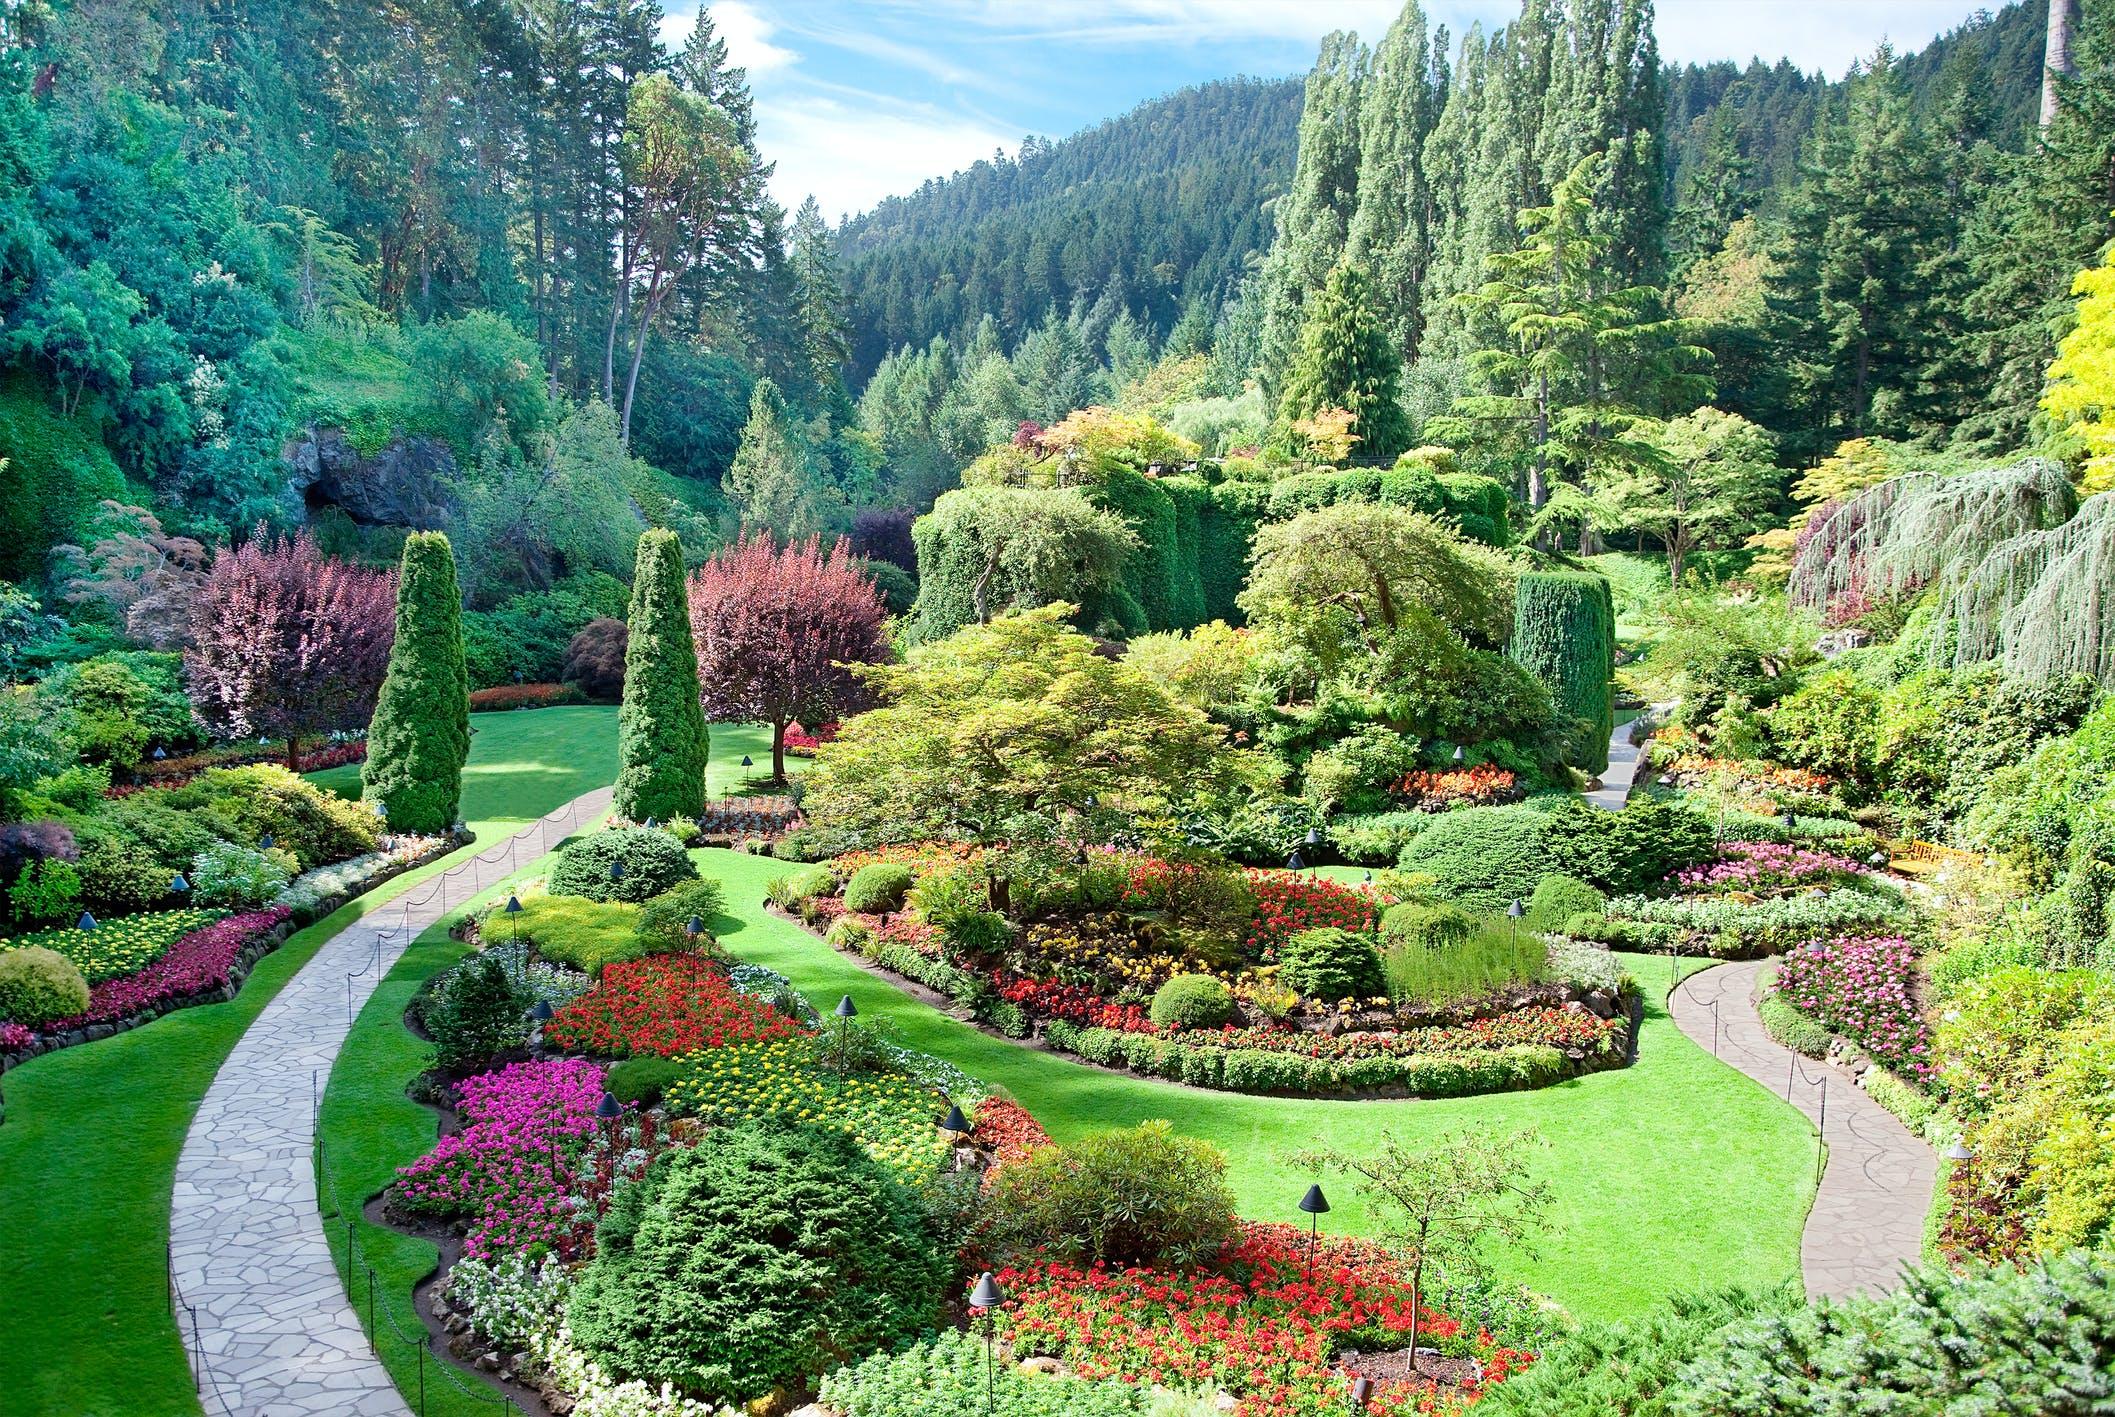 Butchart Gardens in British Columbia